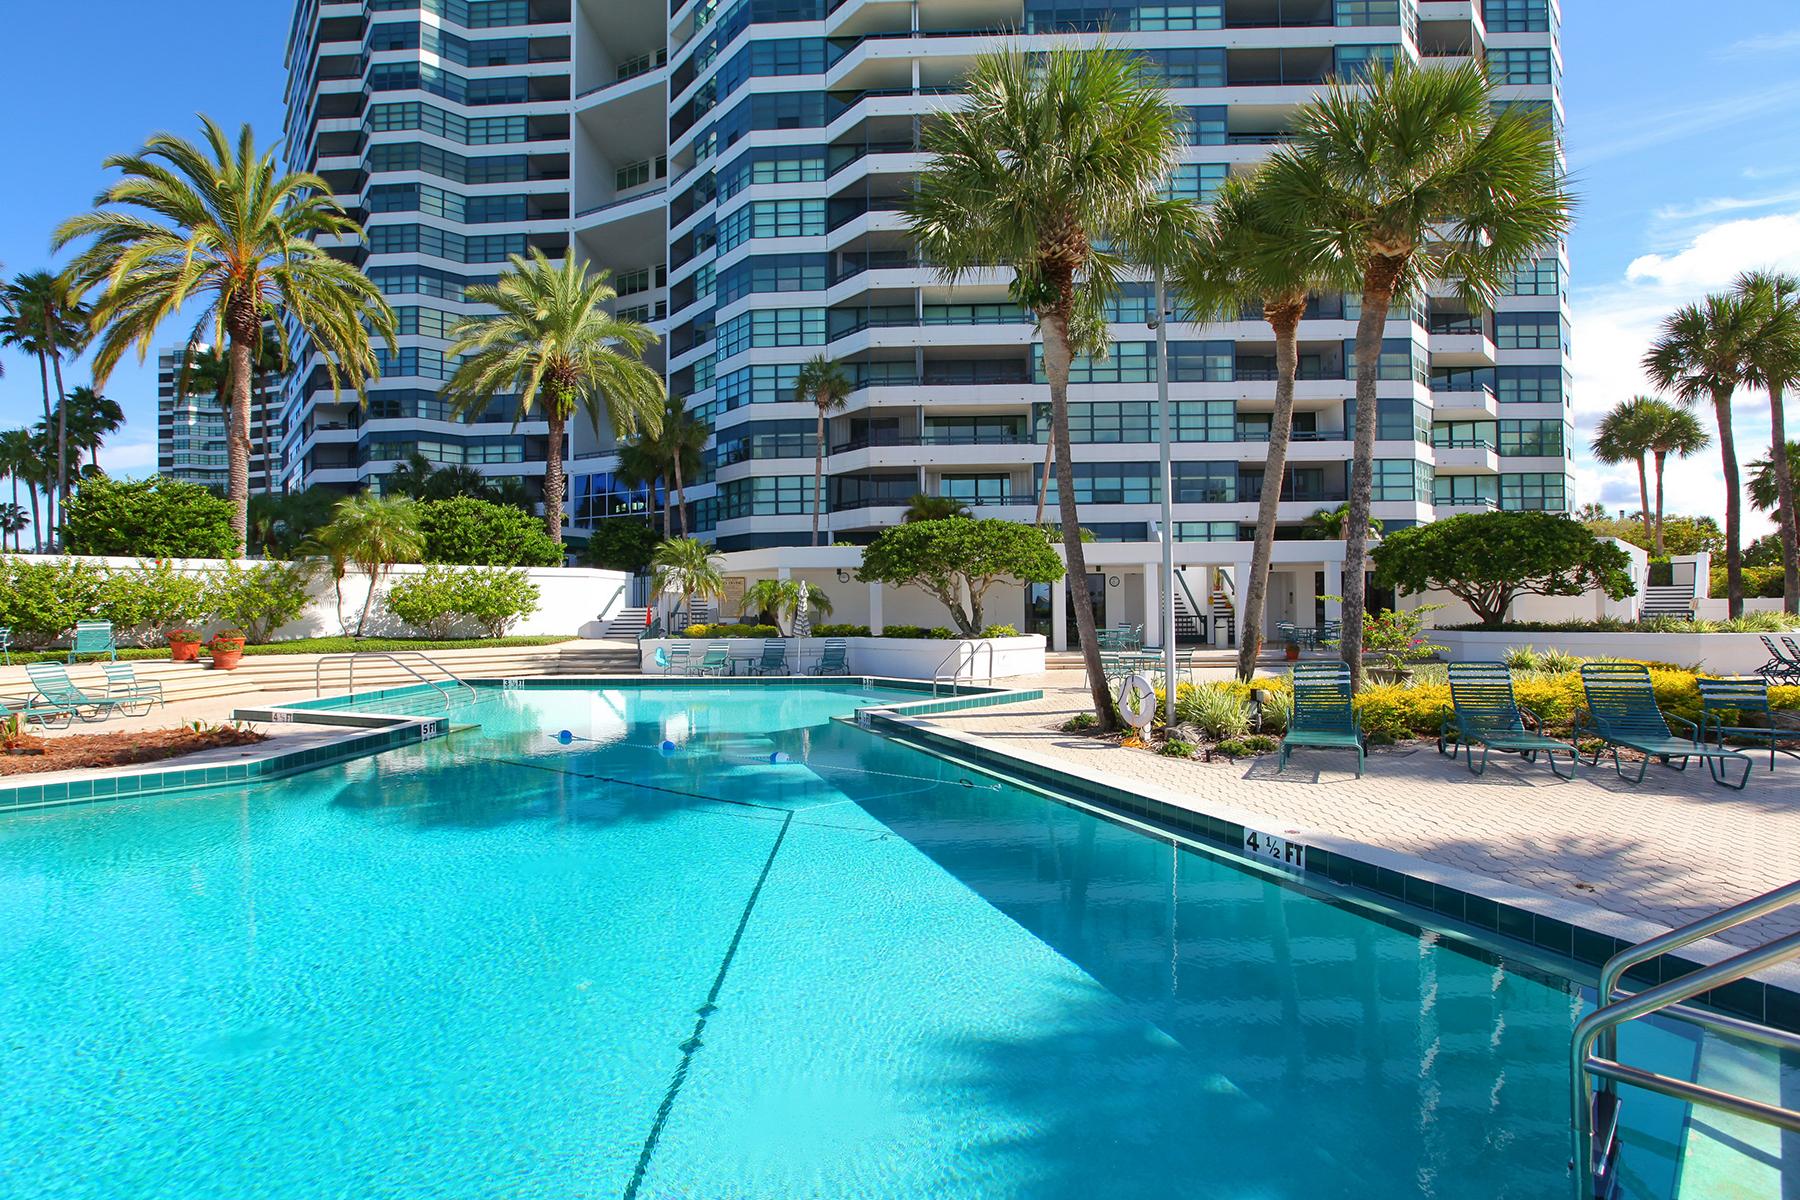 Condominium for Sale at CONDO ON THE BAY 888 Blvd Of The Arts 1901, 1902, Sarasota, Florida, 34236 United States